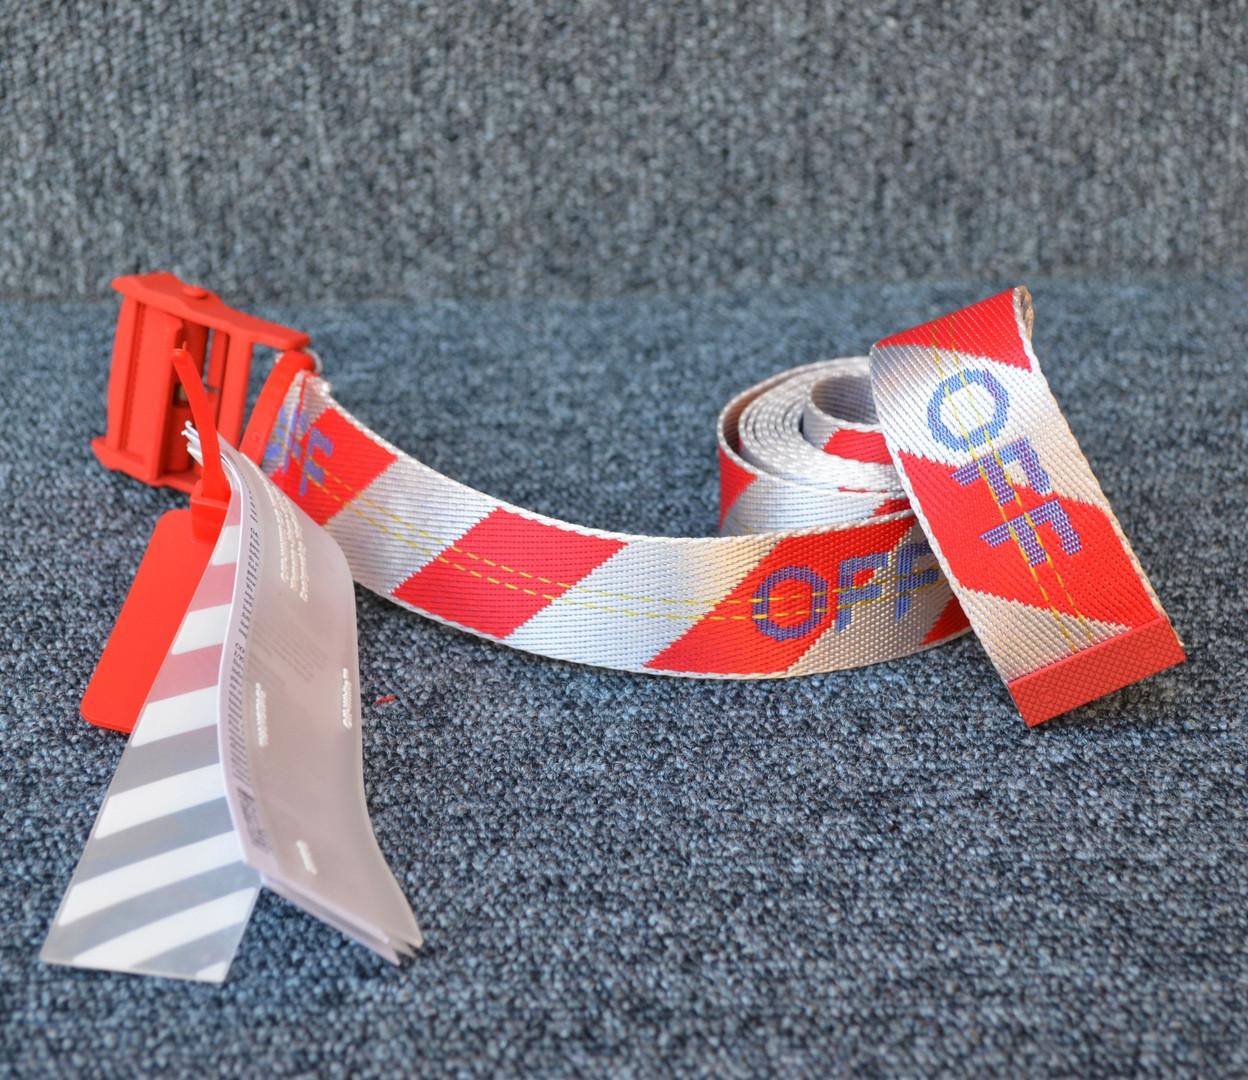 Ремень Off-White striped red-white, Реплика